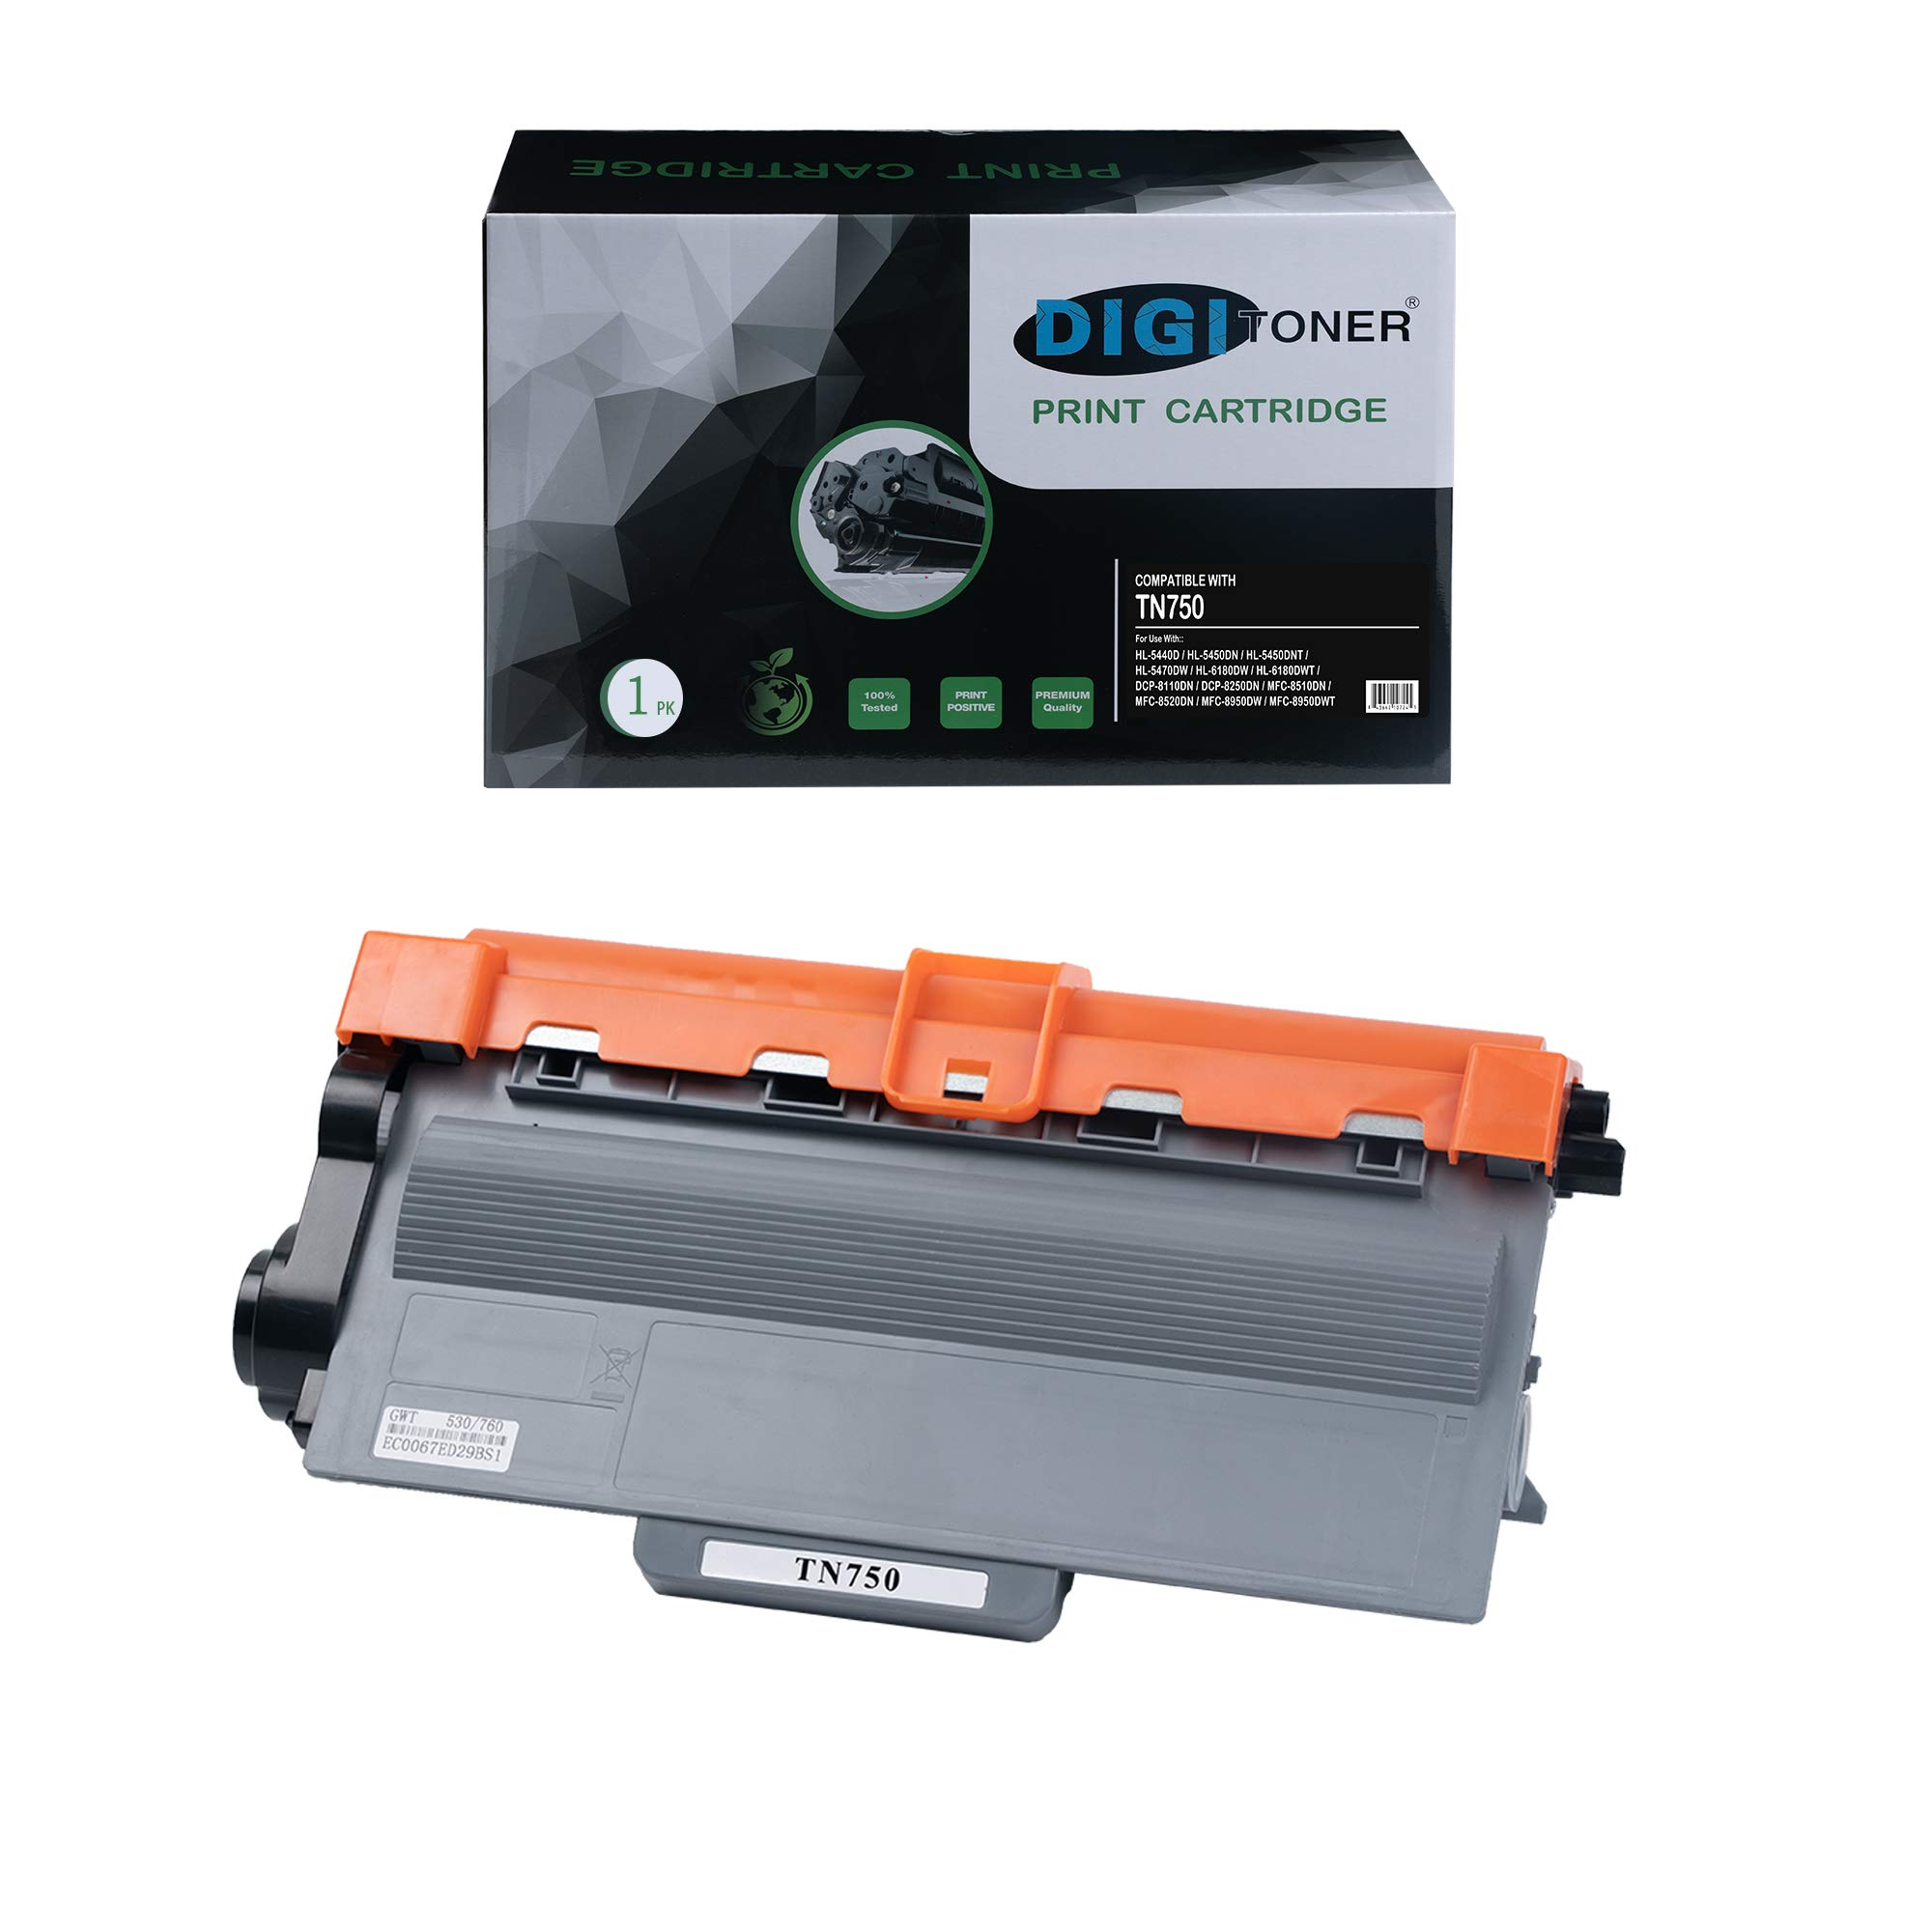 DIGITONER Compatible TN750 TN720 Toner Cartridge – TN-750 TN-720 High Yield Toner Cartridge Replacement for Brother Laser Printer – Black [1 Pack]